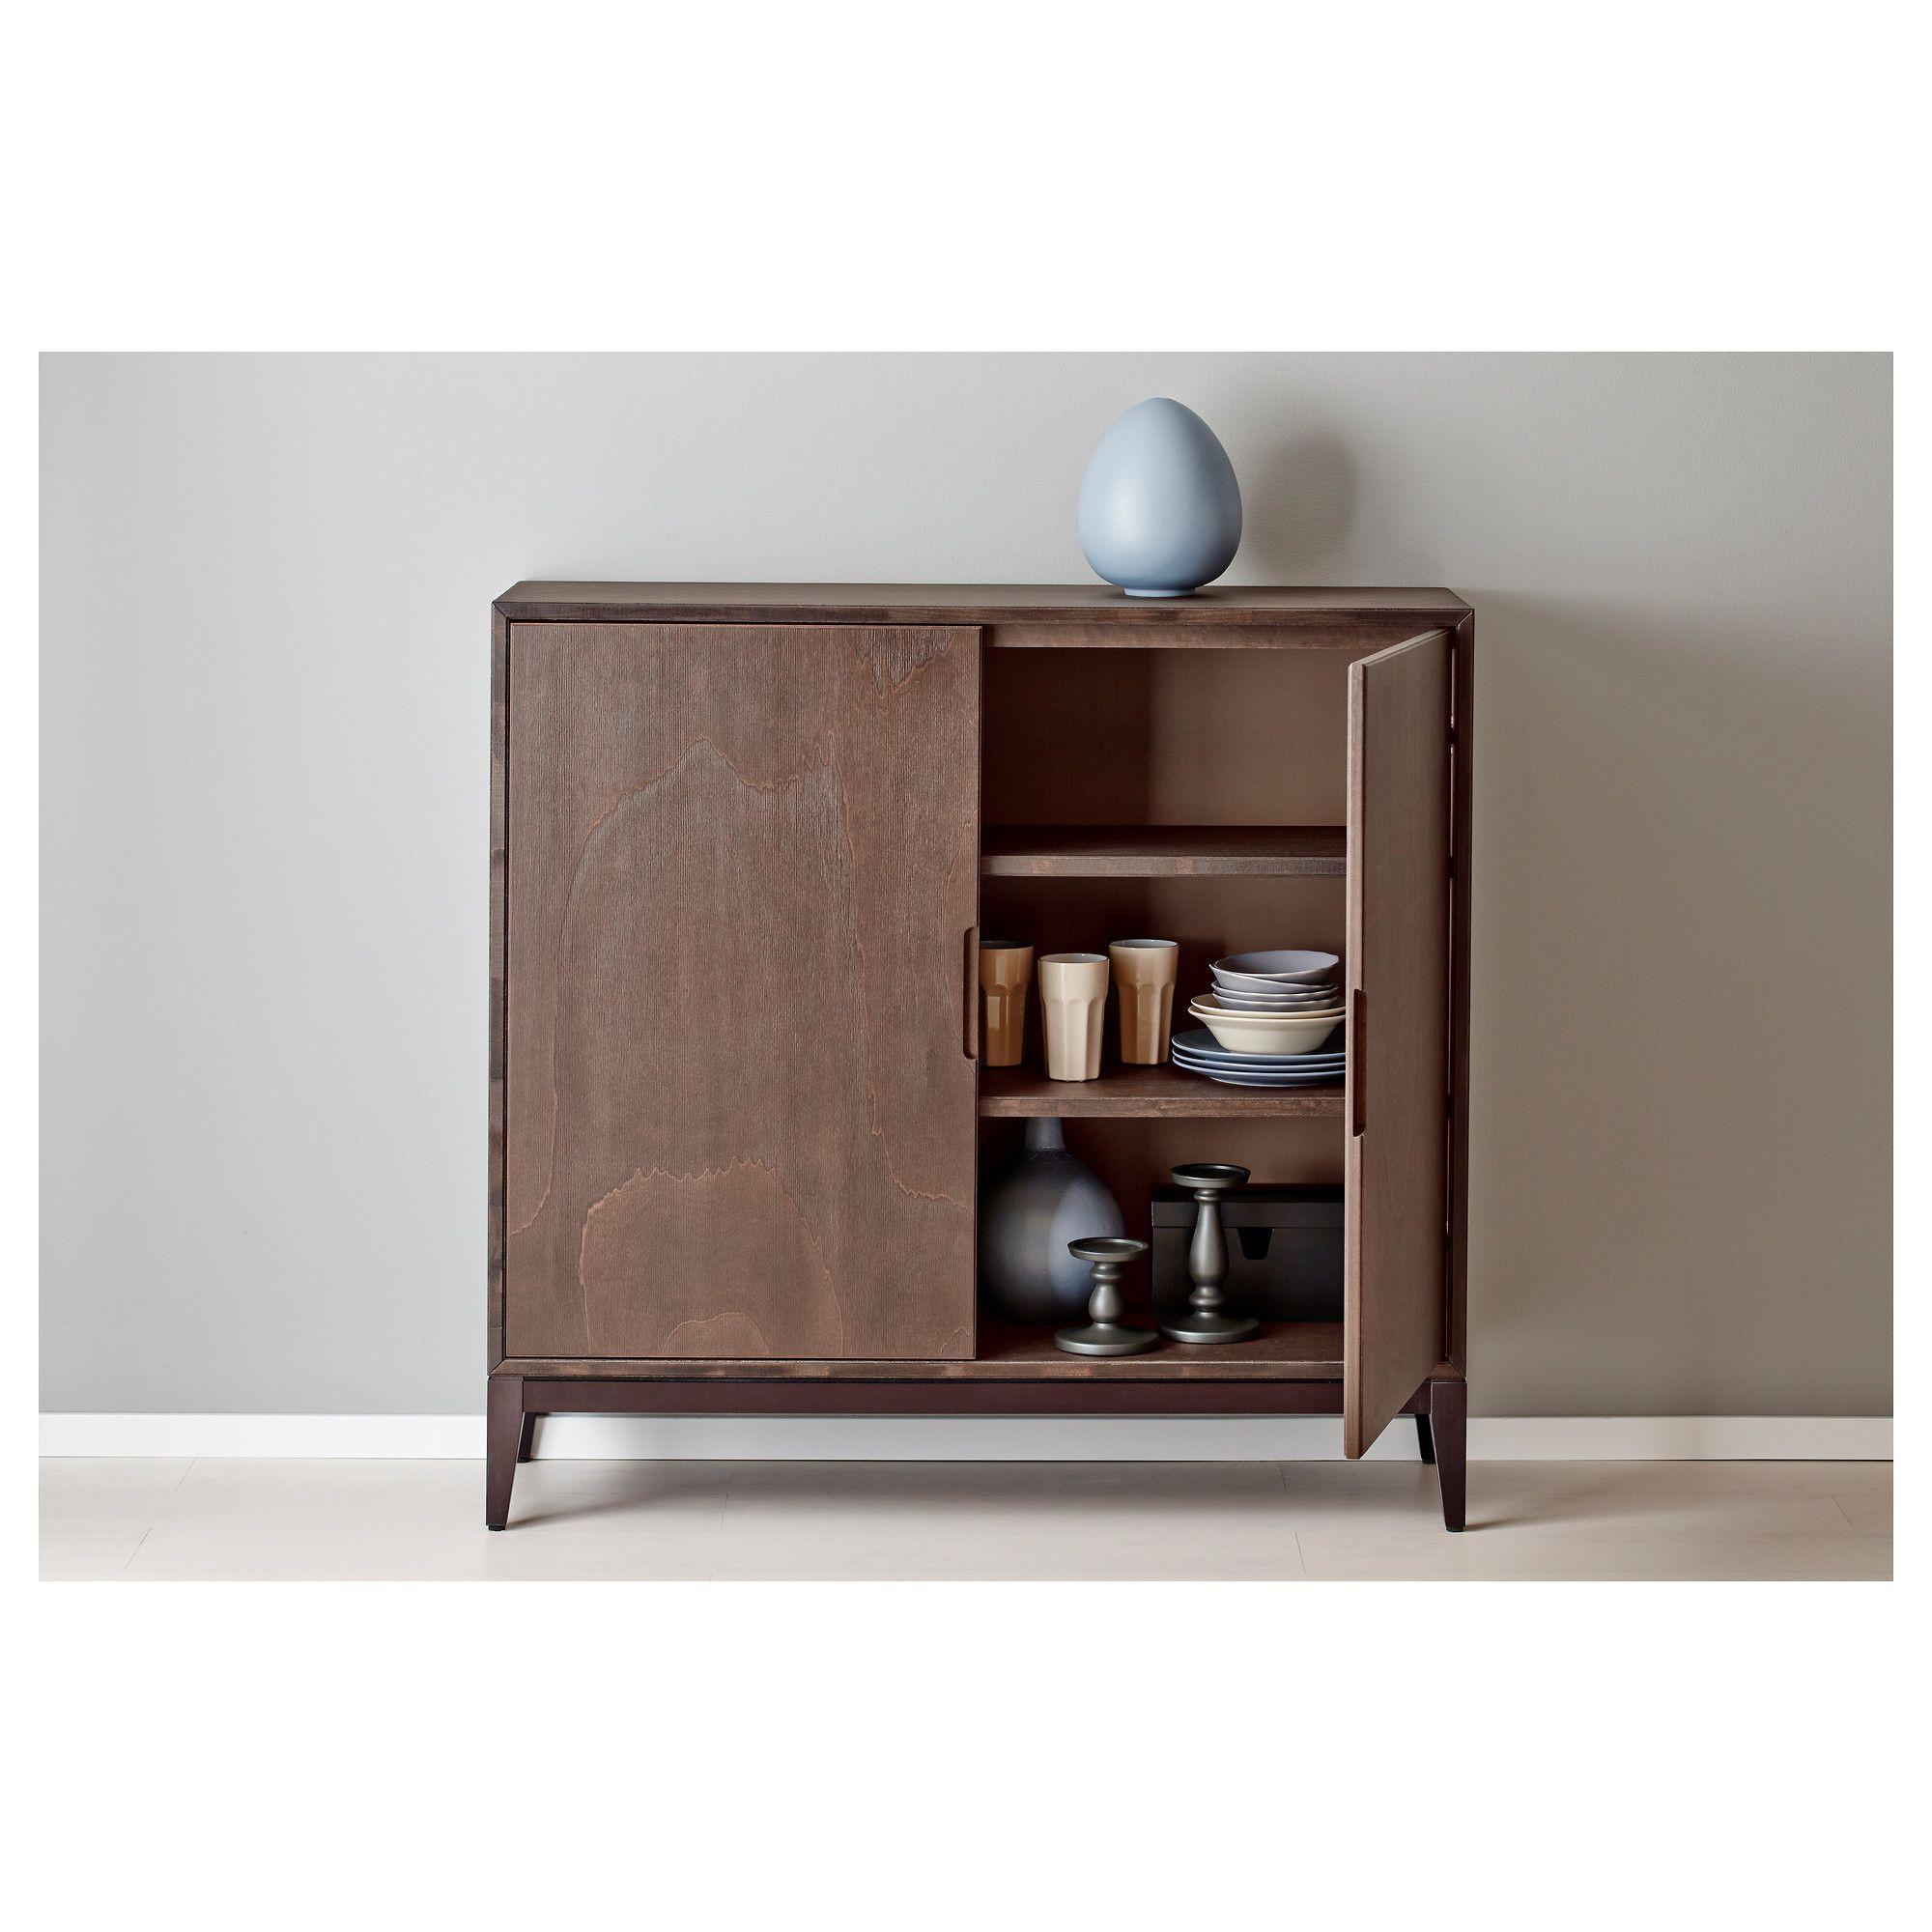 Hallway storage cabinet  Gevonden op pinterest via Google  Inspiratie interieur